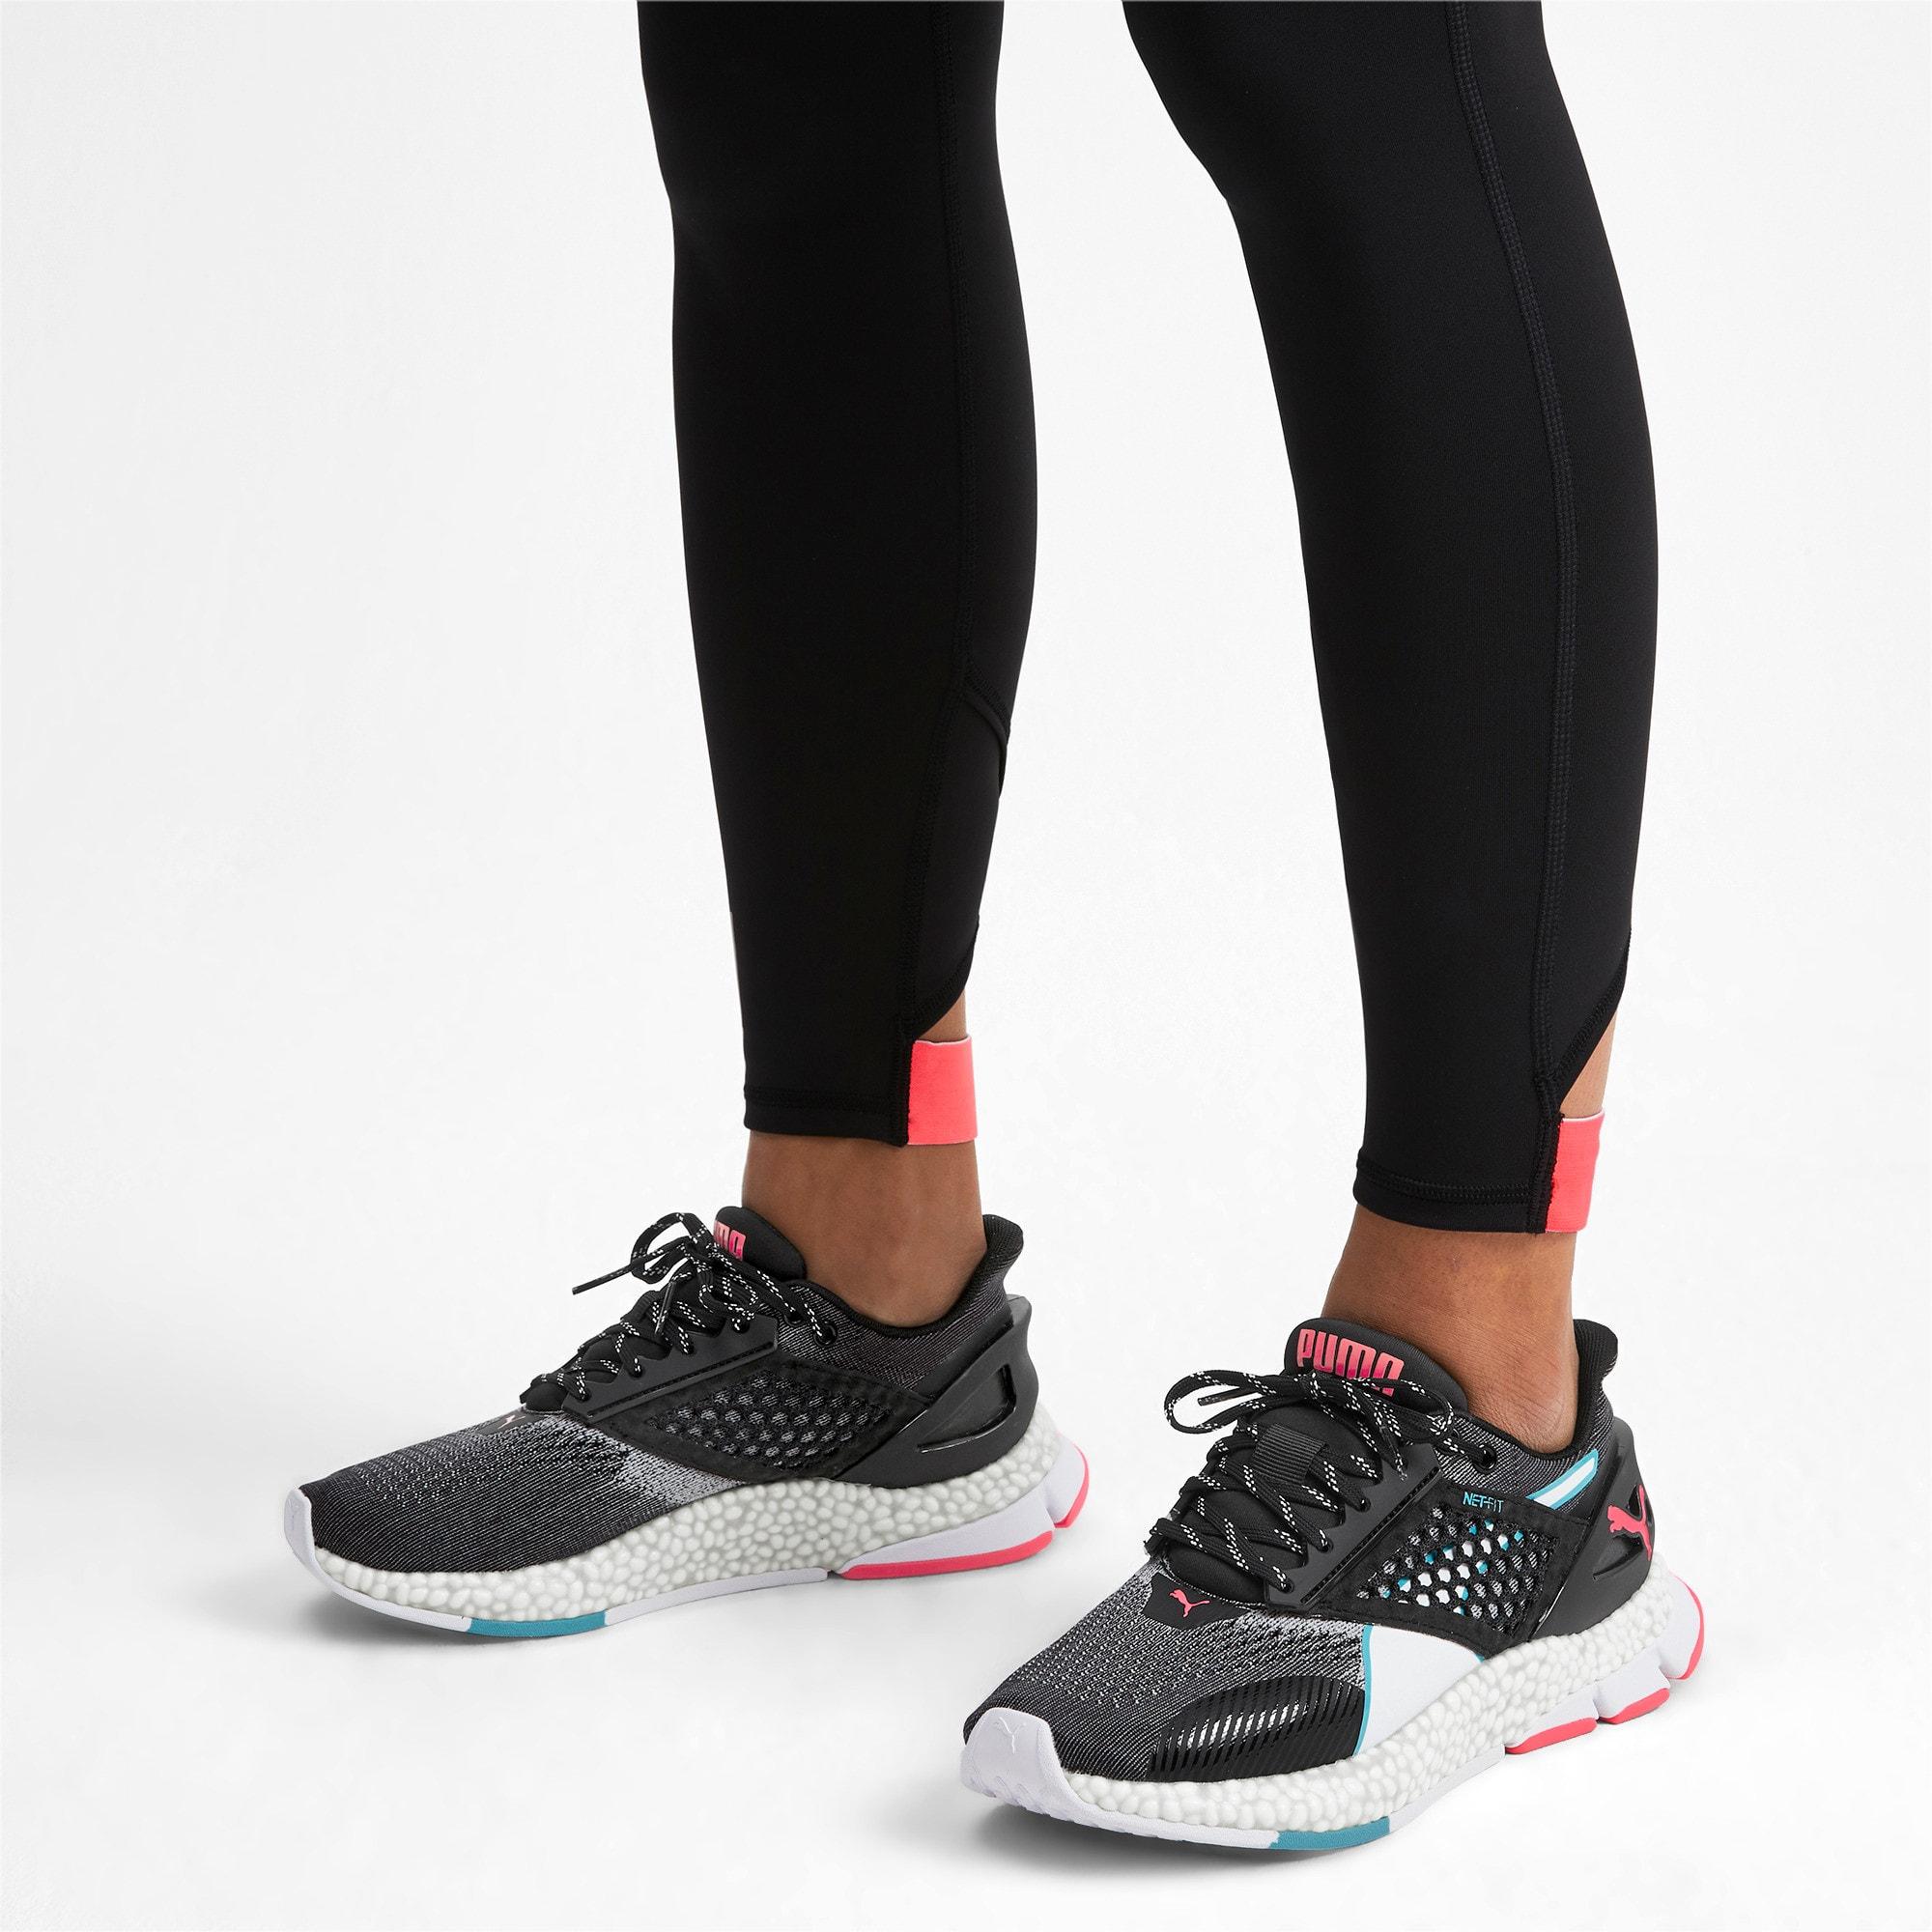 Thumbnail 2 of HYBRID Astro Women's Running Shoes, Puma Black-Pink Alert, medium